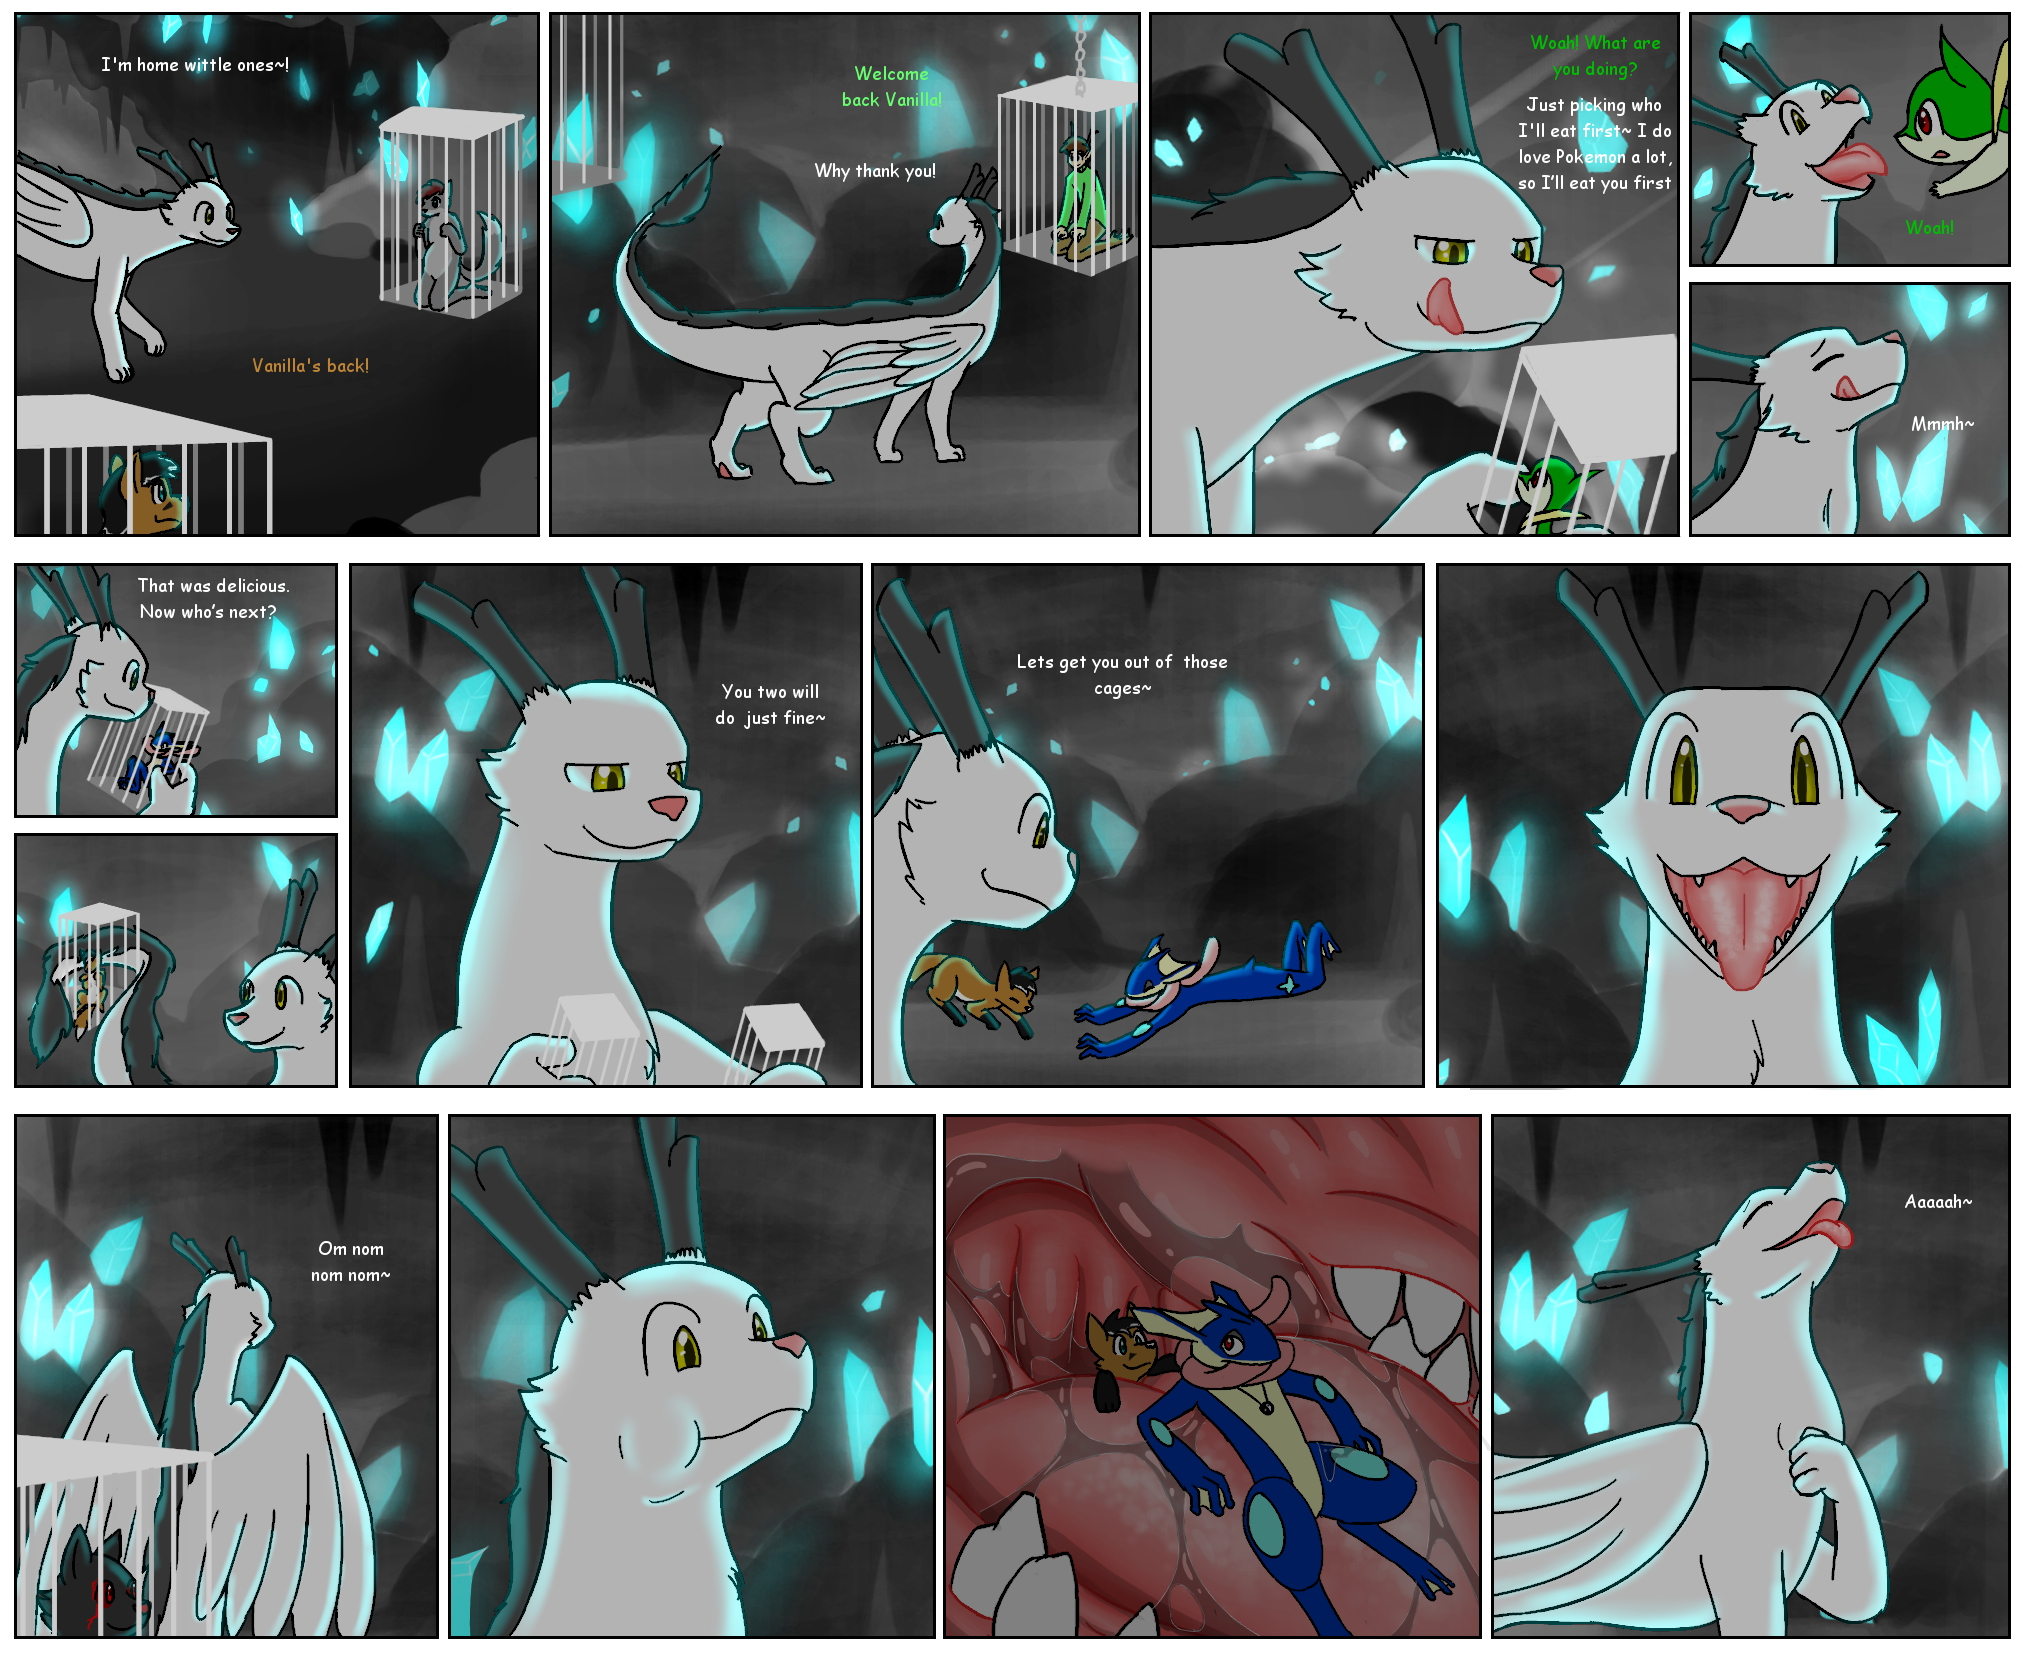 Dragon vore animation adult image